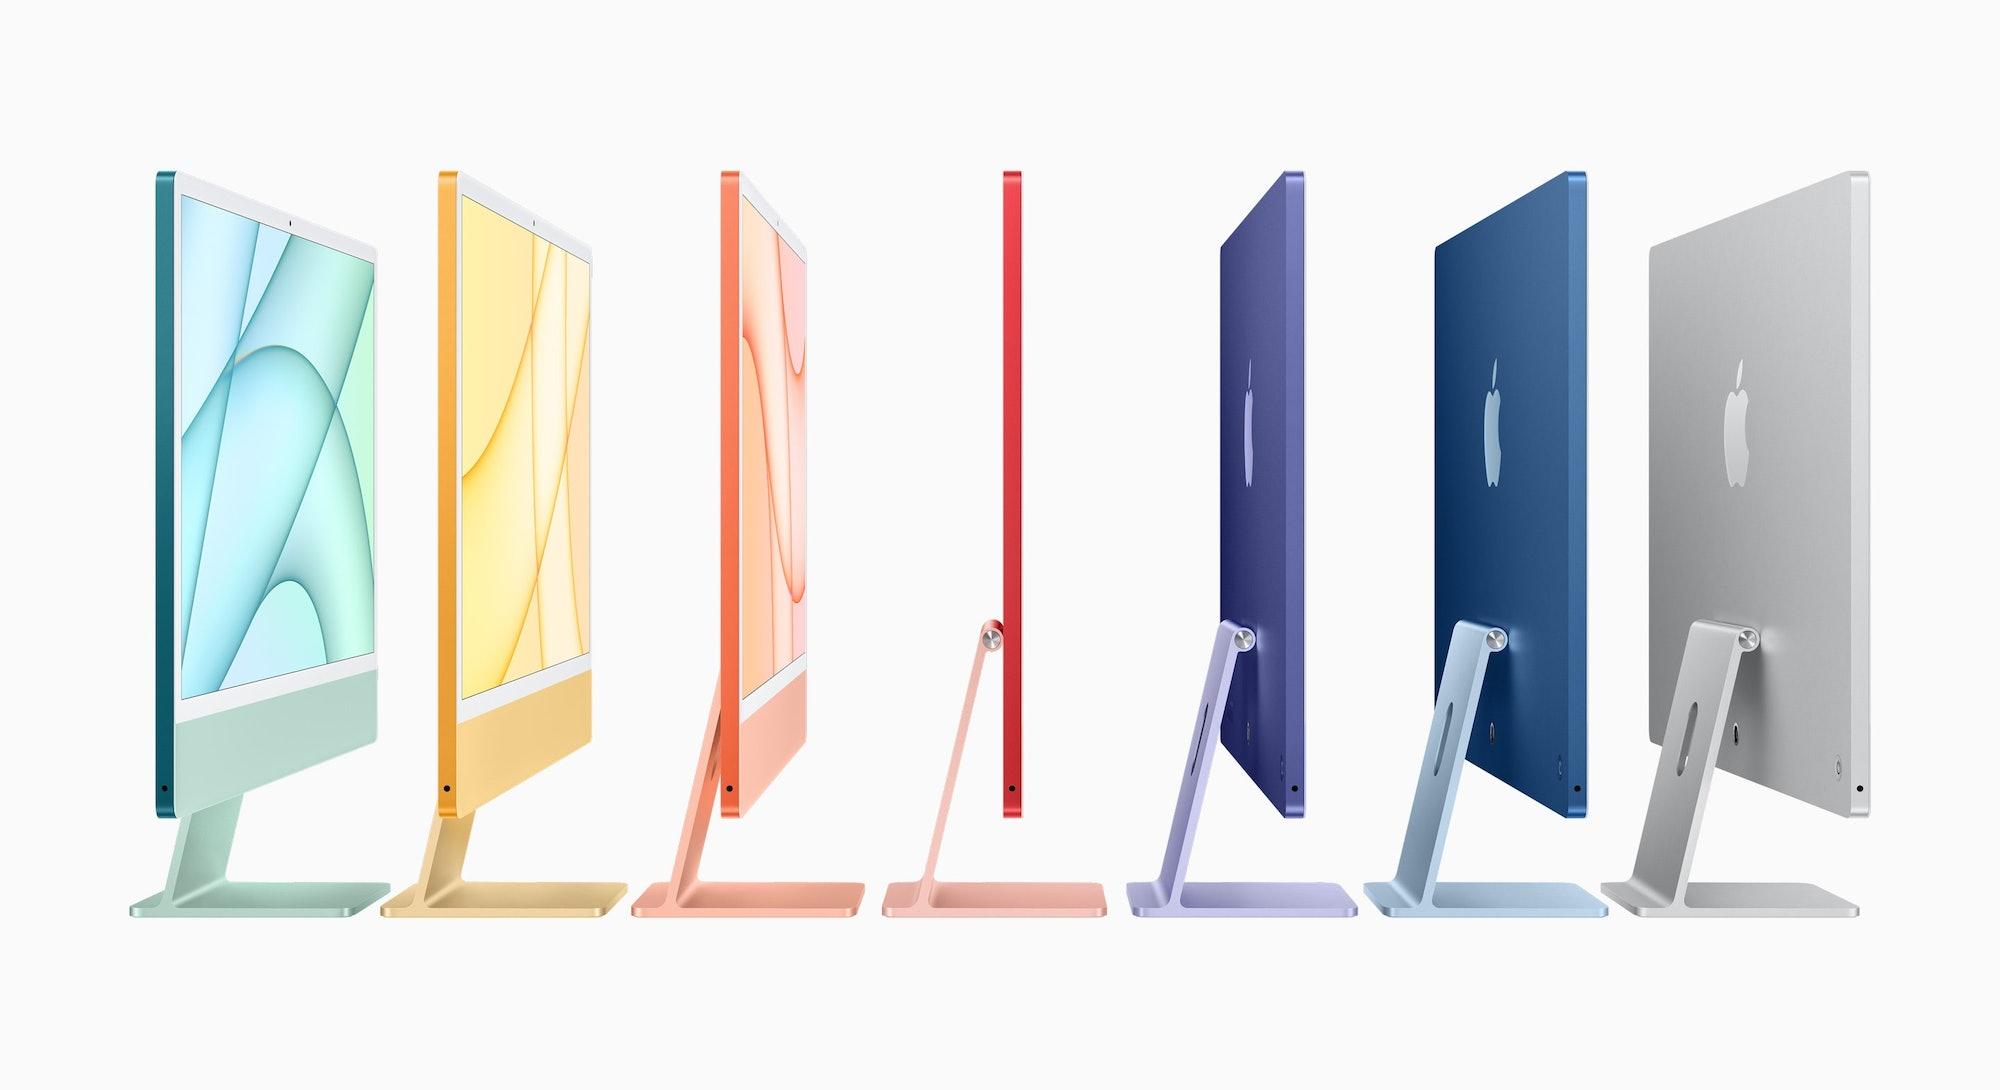 Apple's newest iMacs. Computers. Apple. Mac. Mac OS. Hardware. Computers.